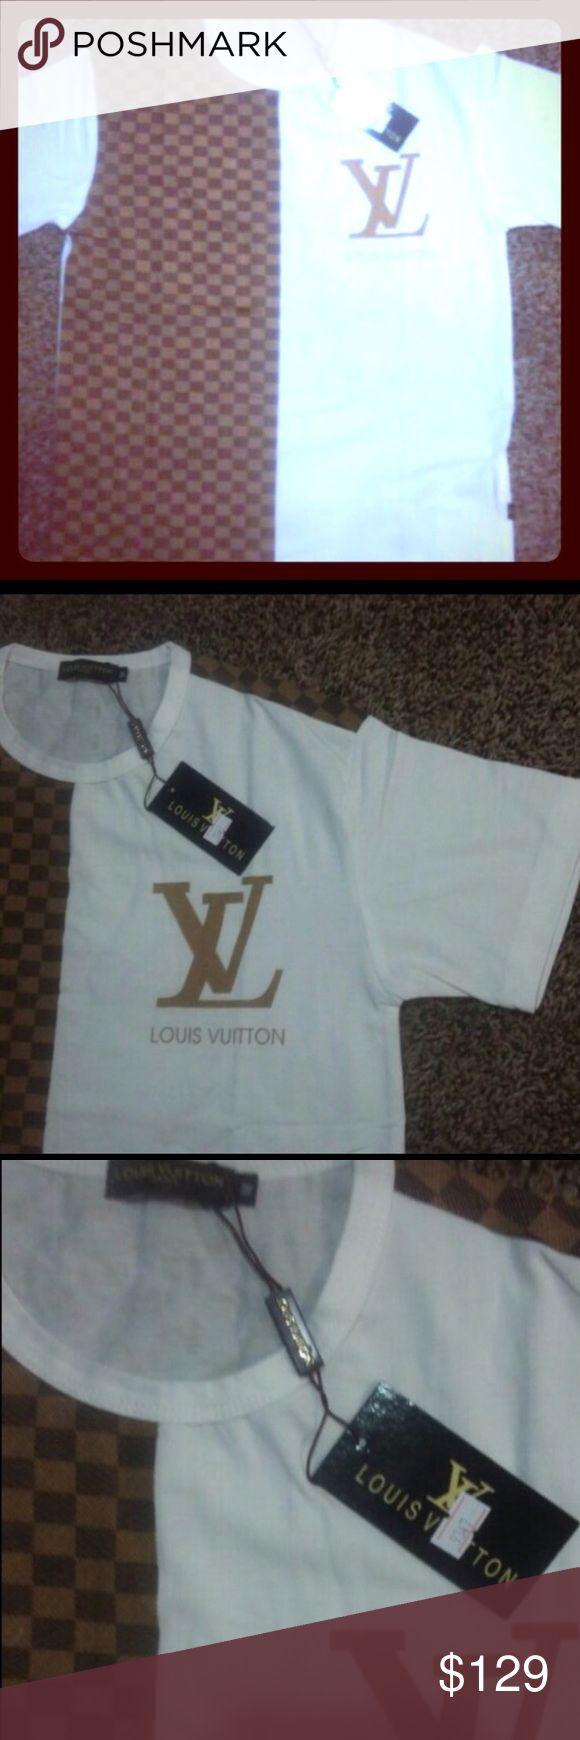 NWT Mens Louis Vuitton Dramier Long Sleeve Shirt Brand New w tags Louis Vuitton Shirts Tees - Long Sleeve